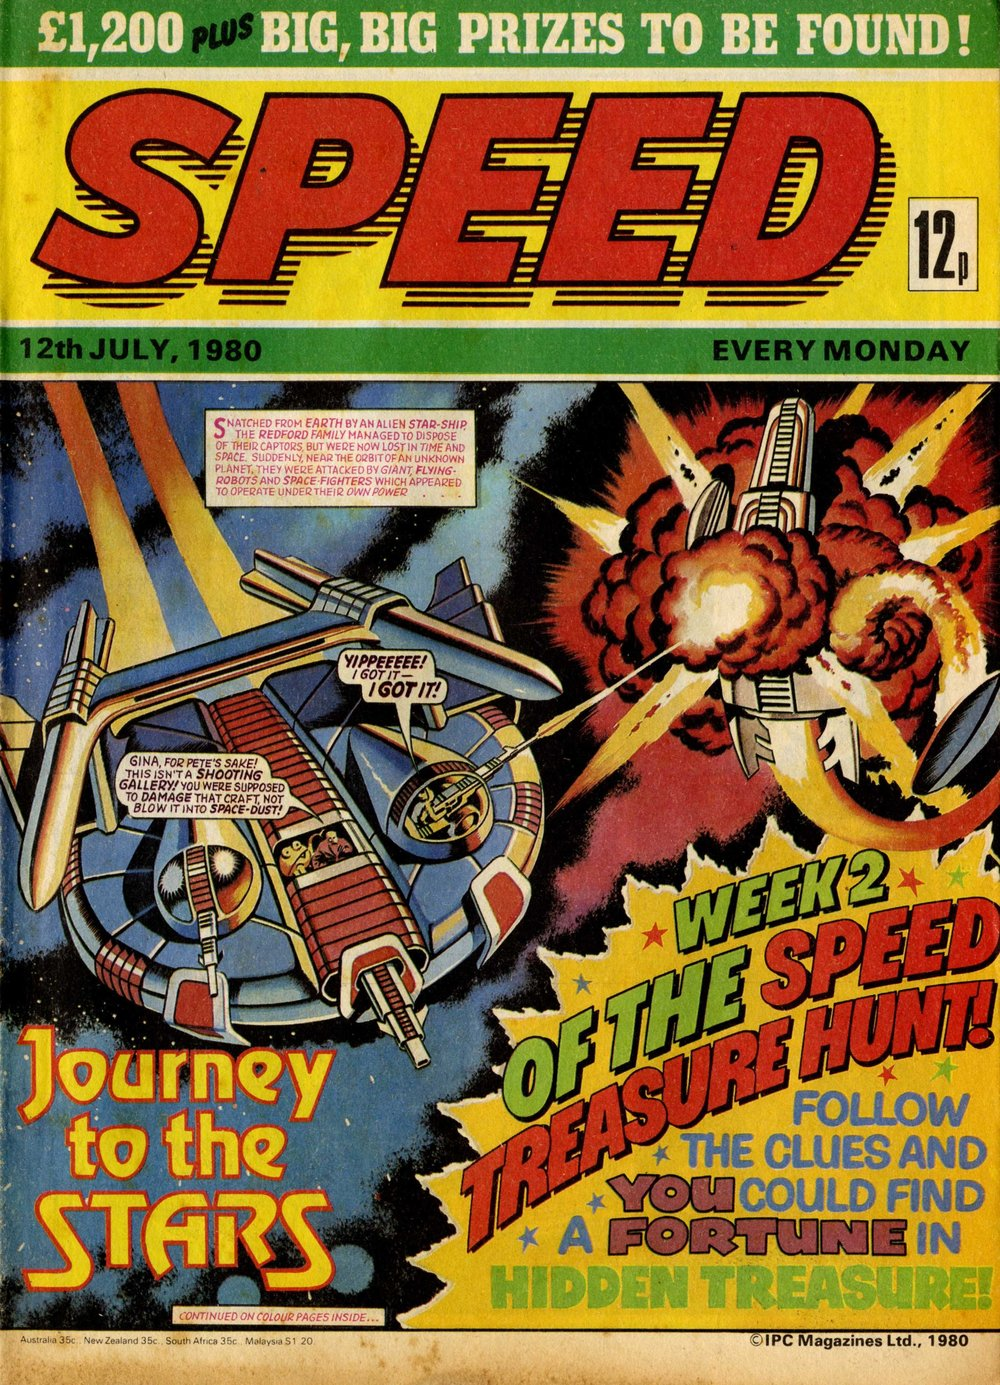 Speed 120780 001.jpg